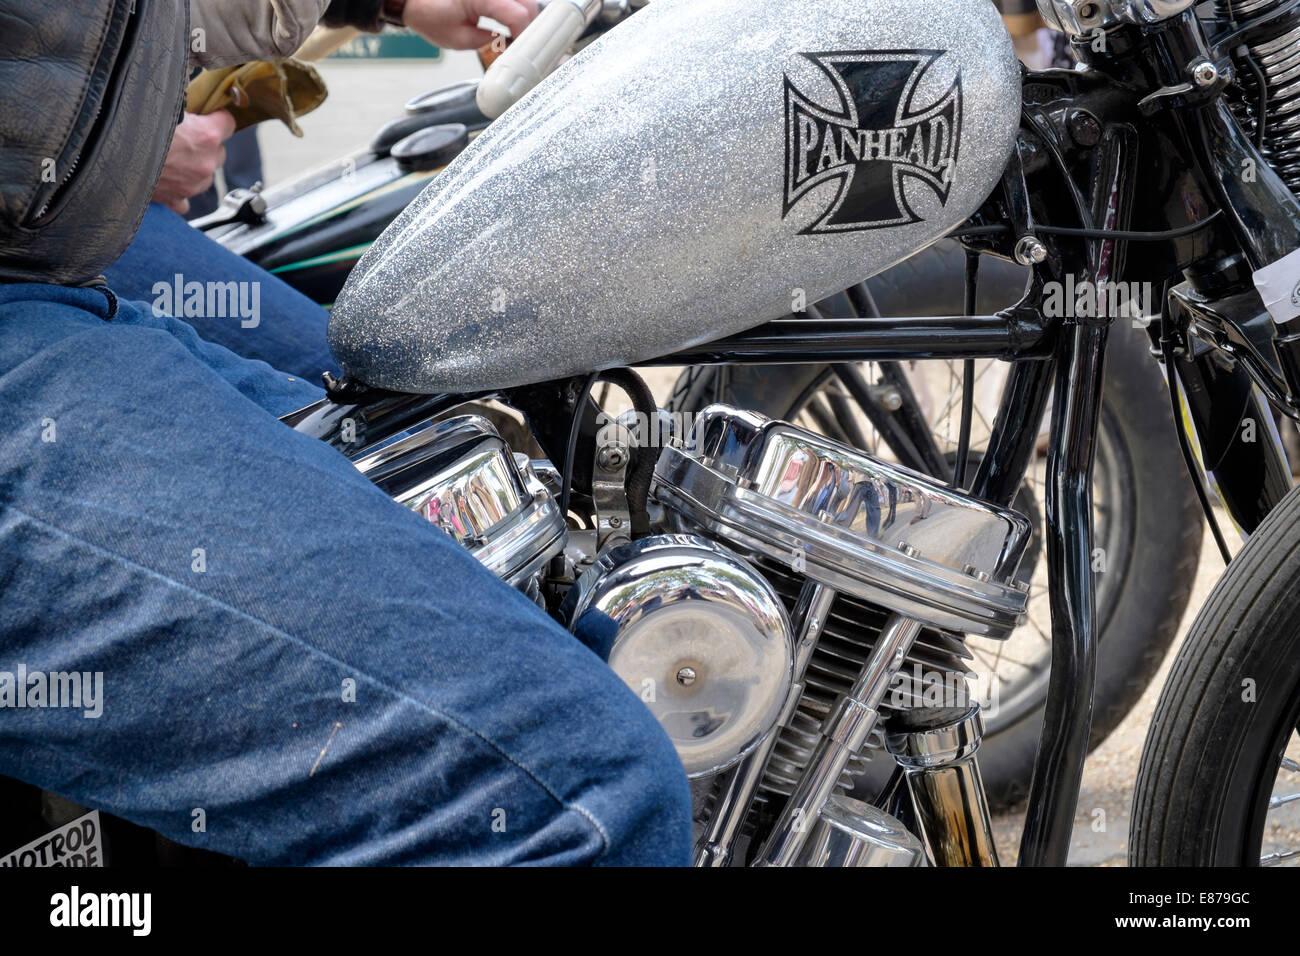 Close up of custom harley davidson motorcycle panhead engine detail and metalflake painted petrol tank on